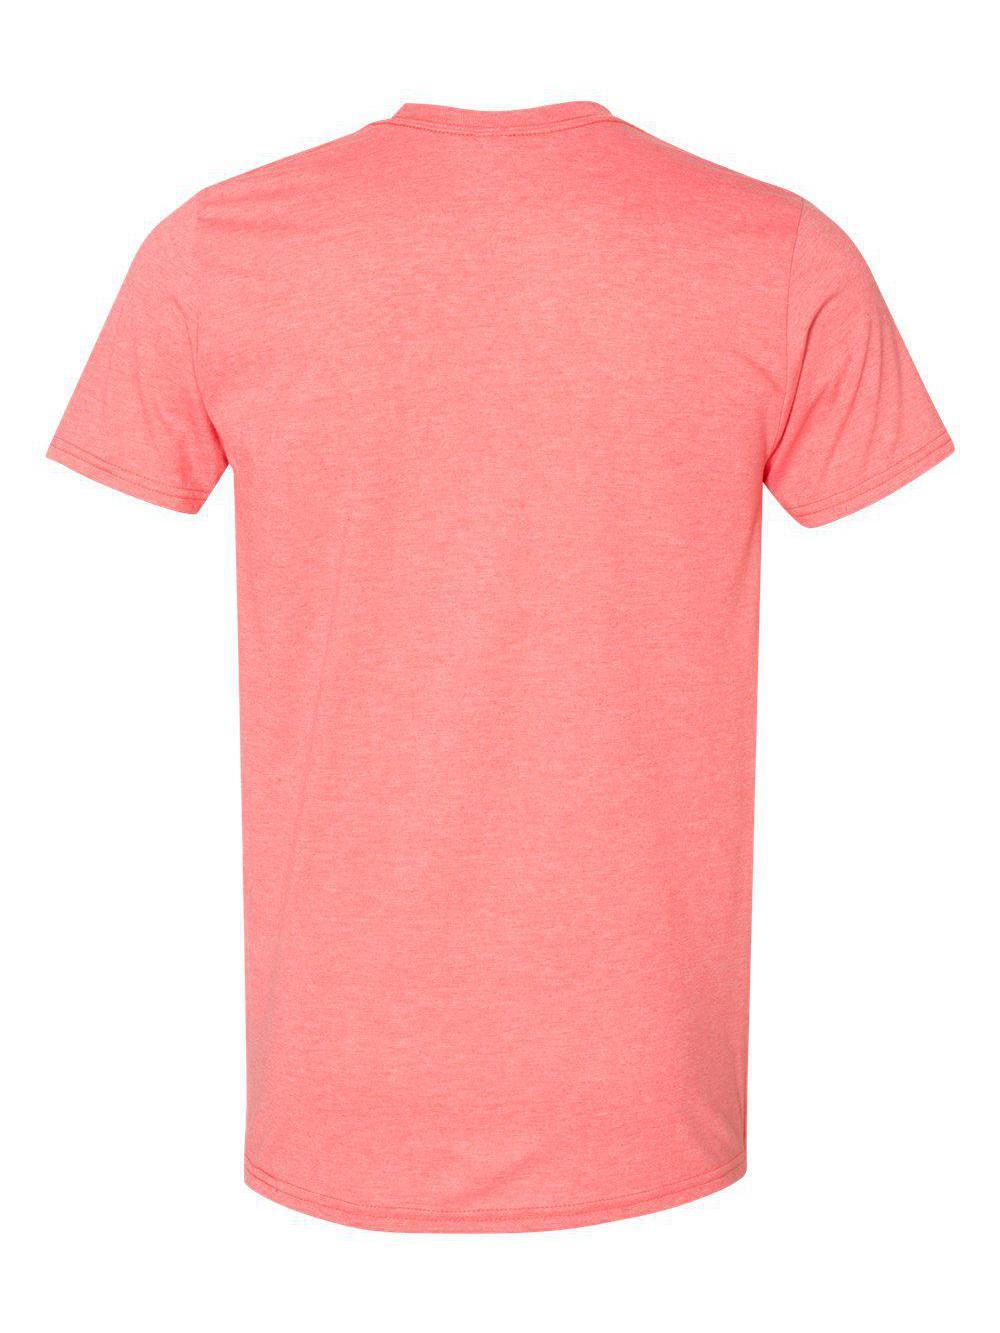 Gildan-Softstyle-T-Shirt-64000 thumbnail 52